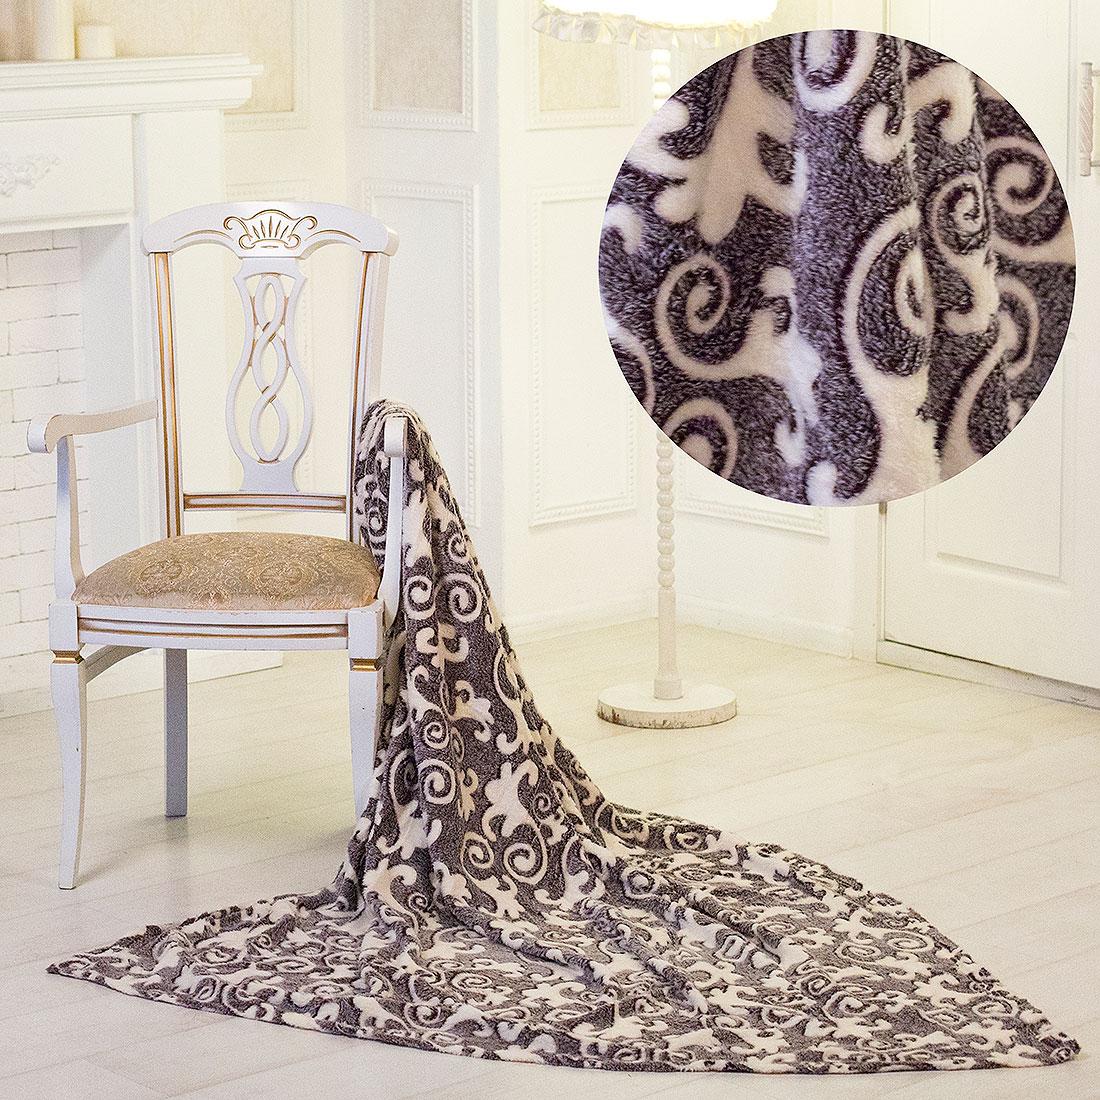 Плед Eleganta Плед Орнамент (150х200) плед eleganta плед помпон цвет фиолетовый 210х220 см